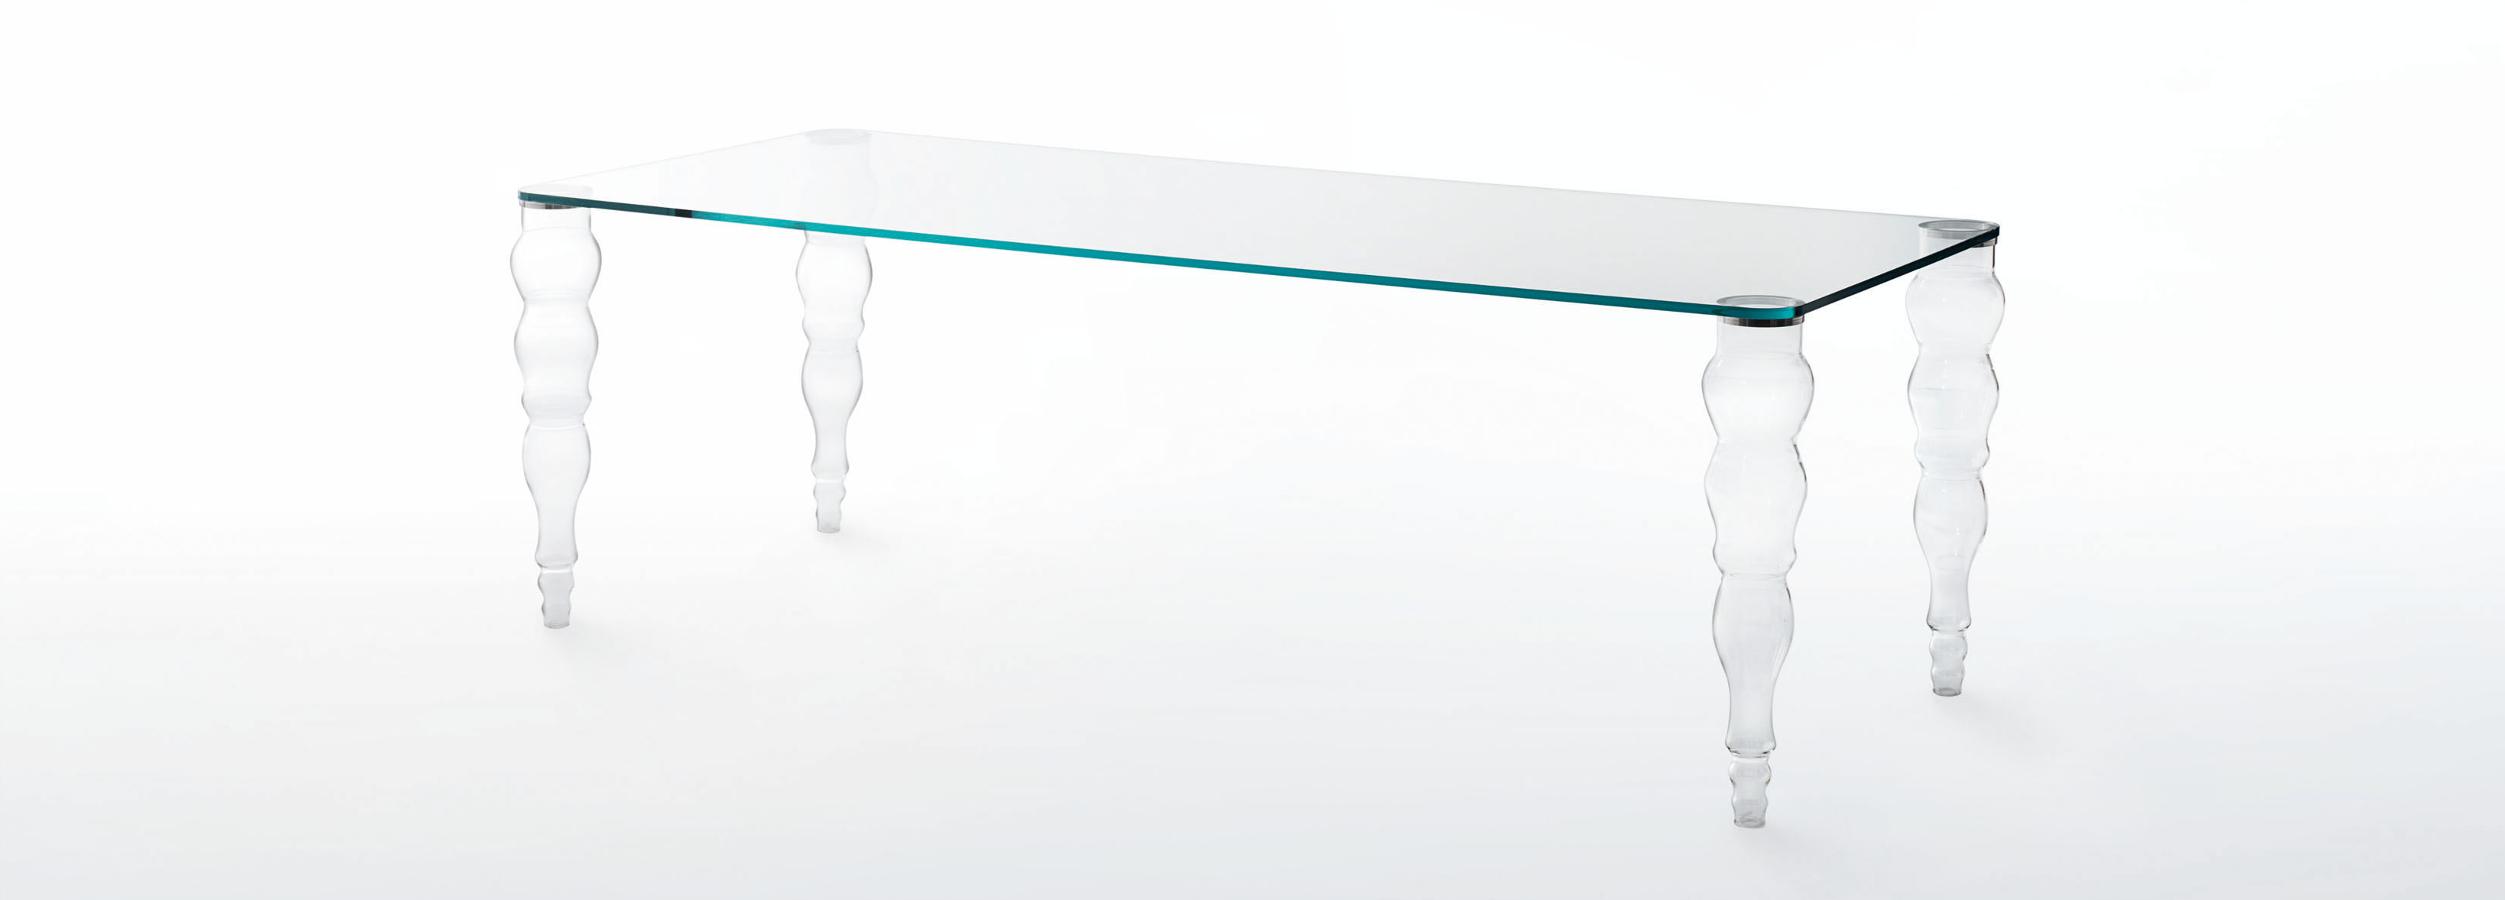 Glastisch-post-modern-glas-italia